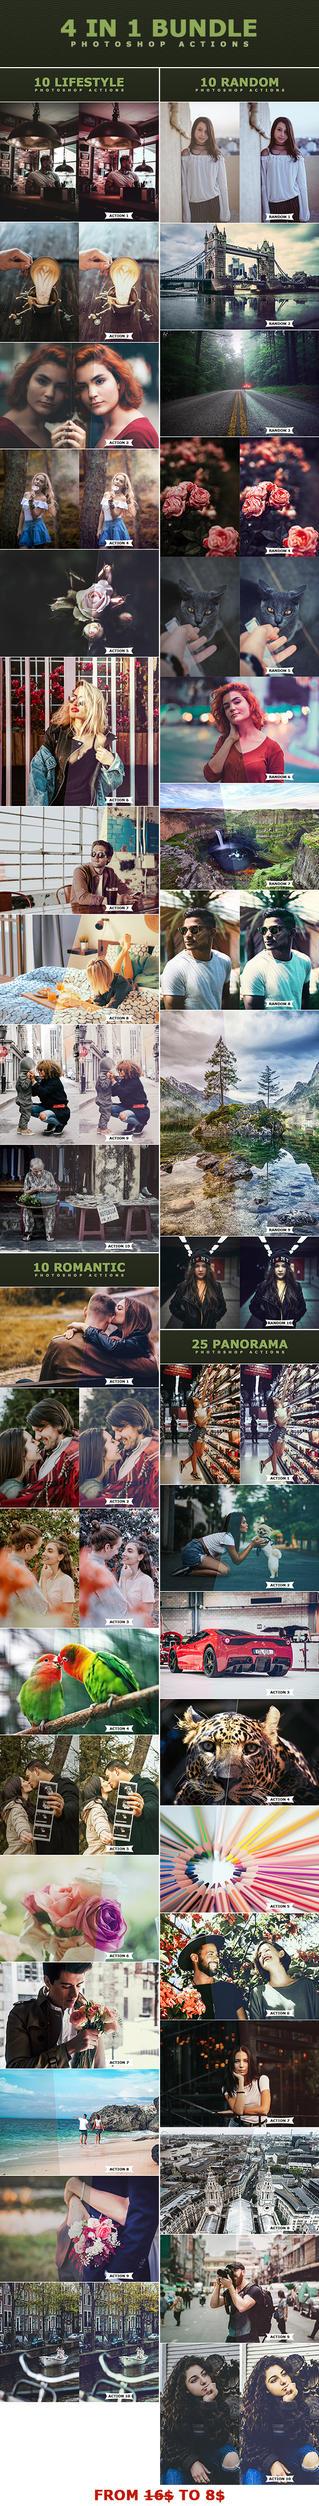 4 IN 1 Photoshop Actions Bundle by ViktorGjokaj